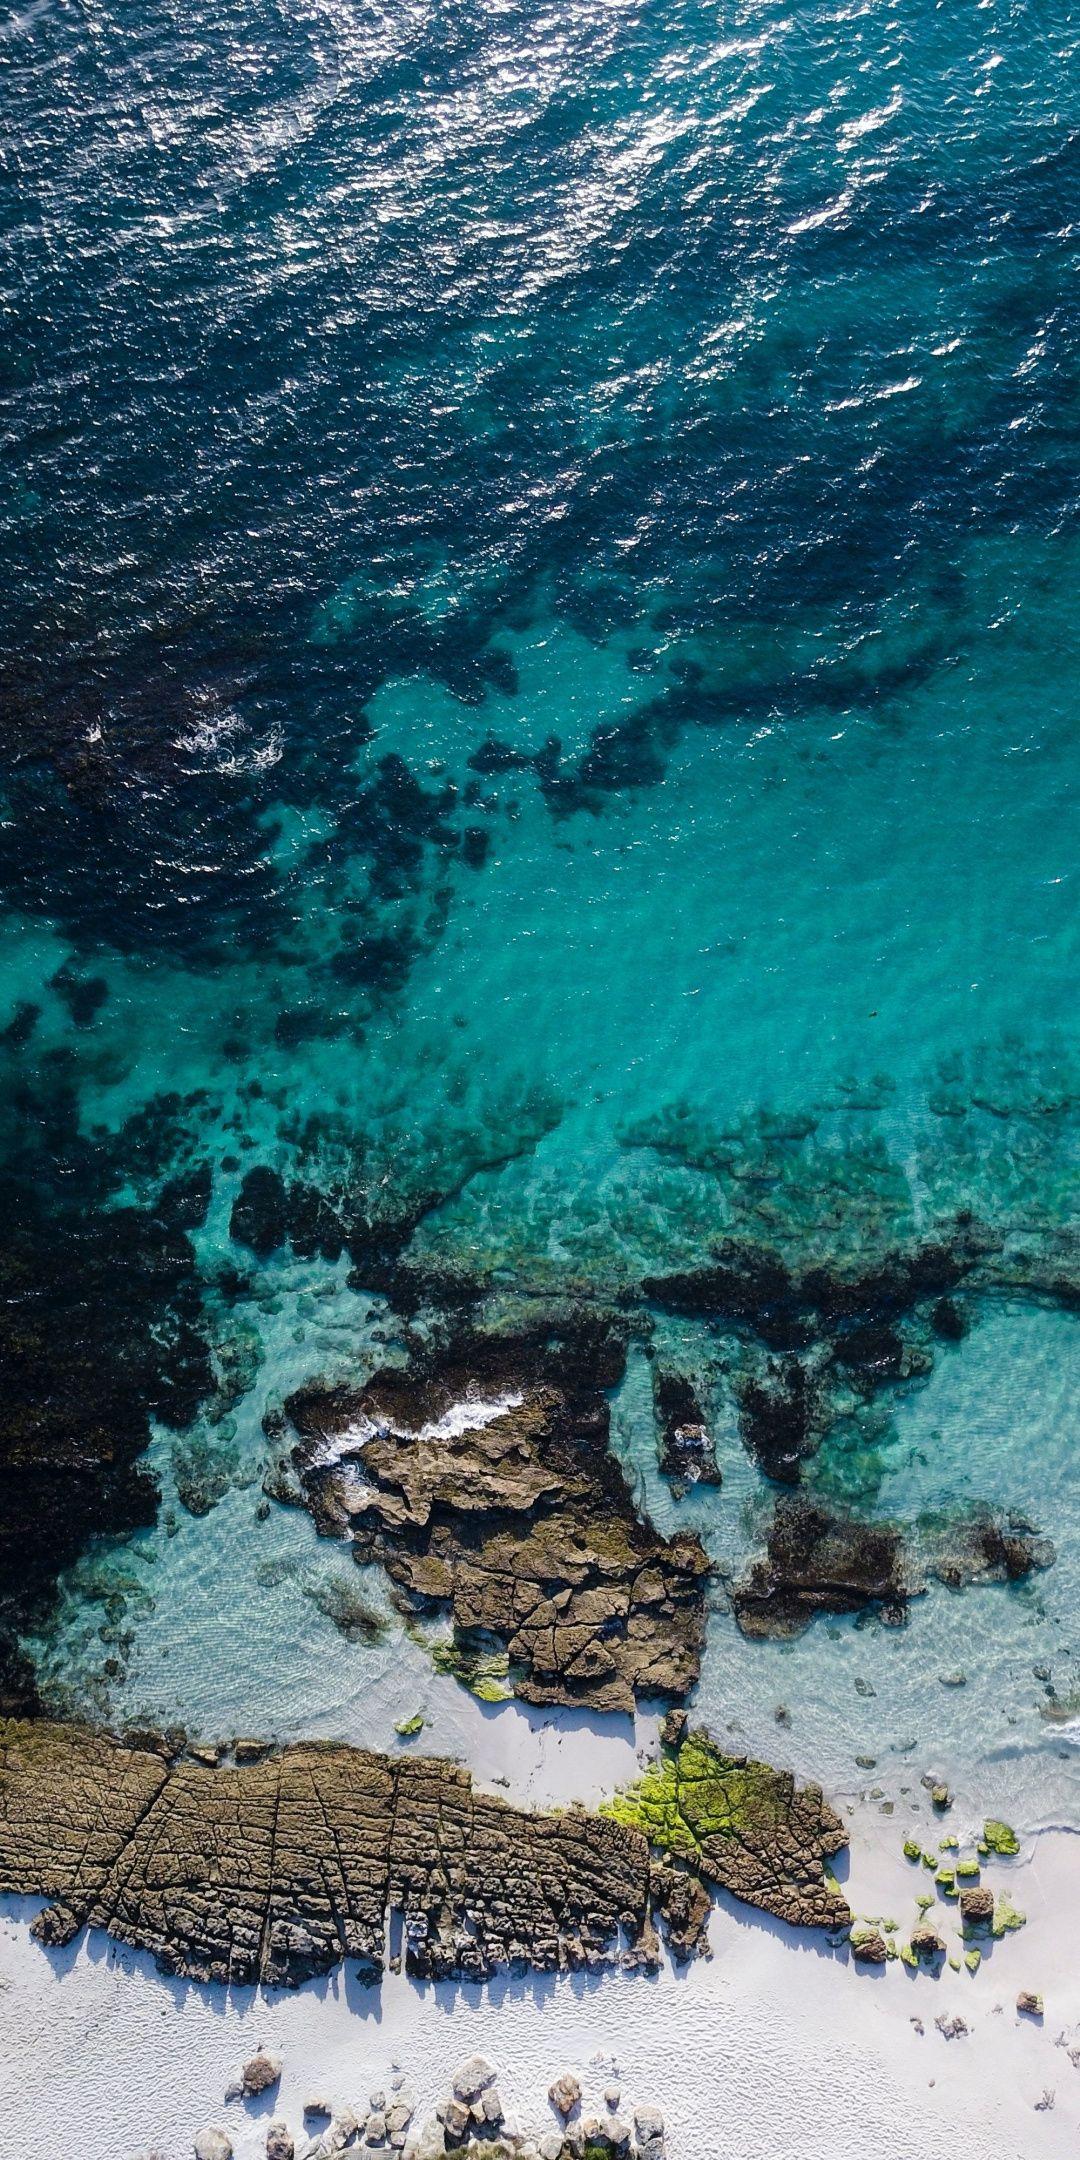 Calm Beach Body Of Water Sea Nature 1080x2160 Wallpaper Fotografia De Paisagem Wallpapers Natureza Papeis De Parede Para Iphone